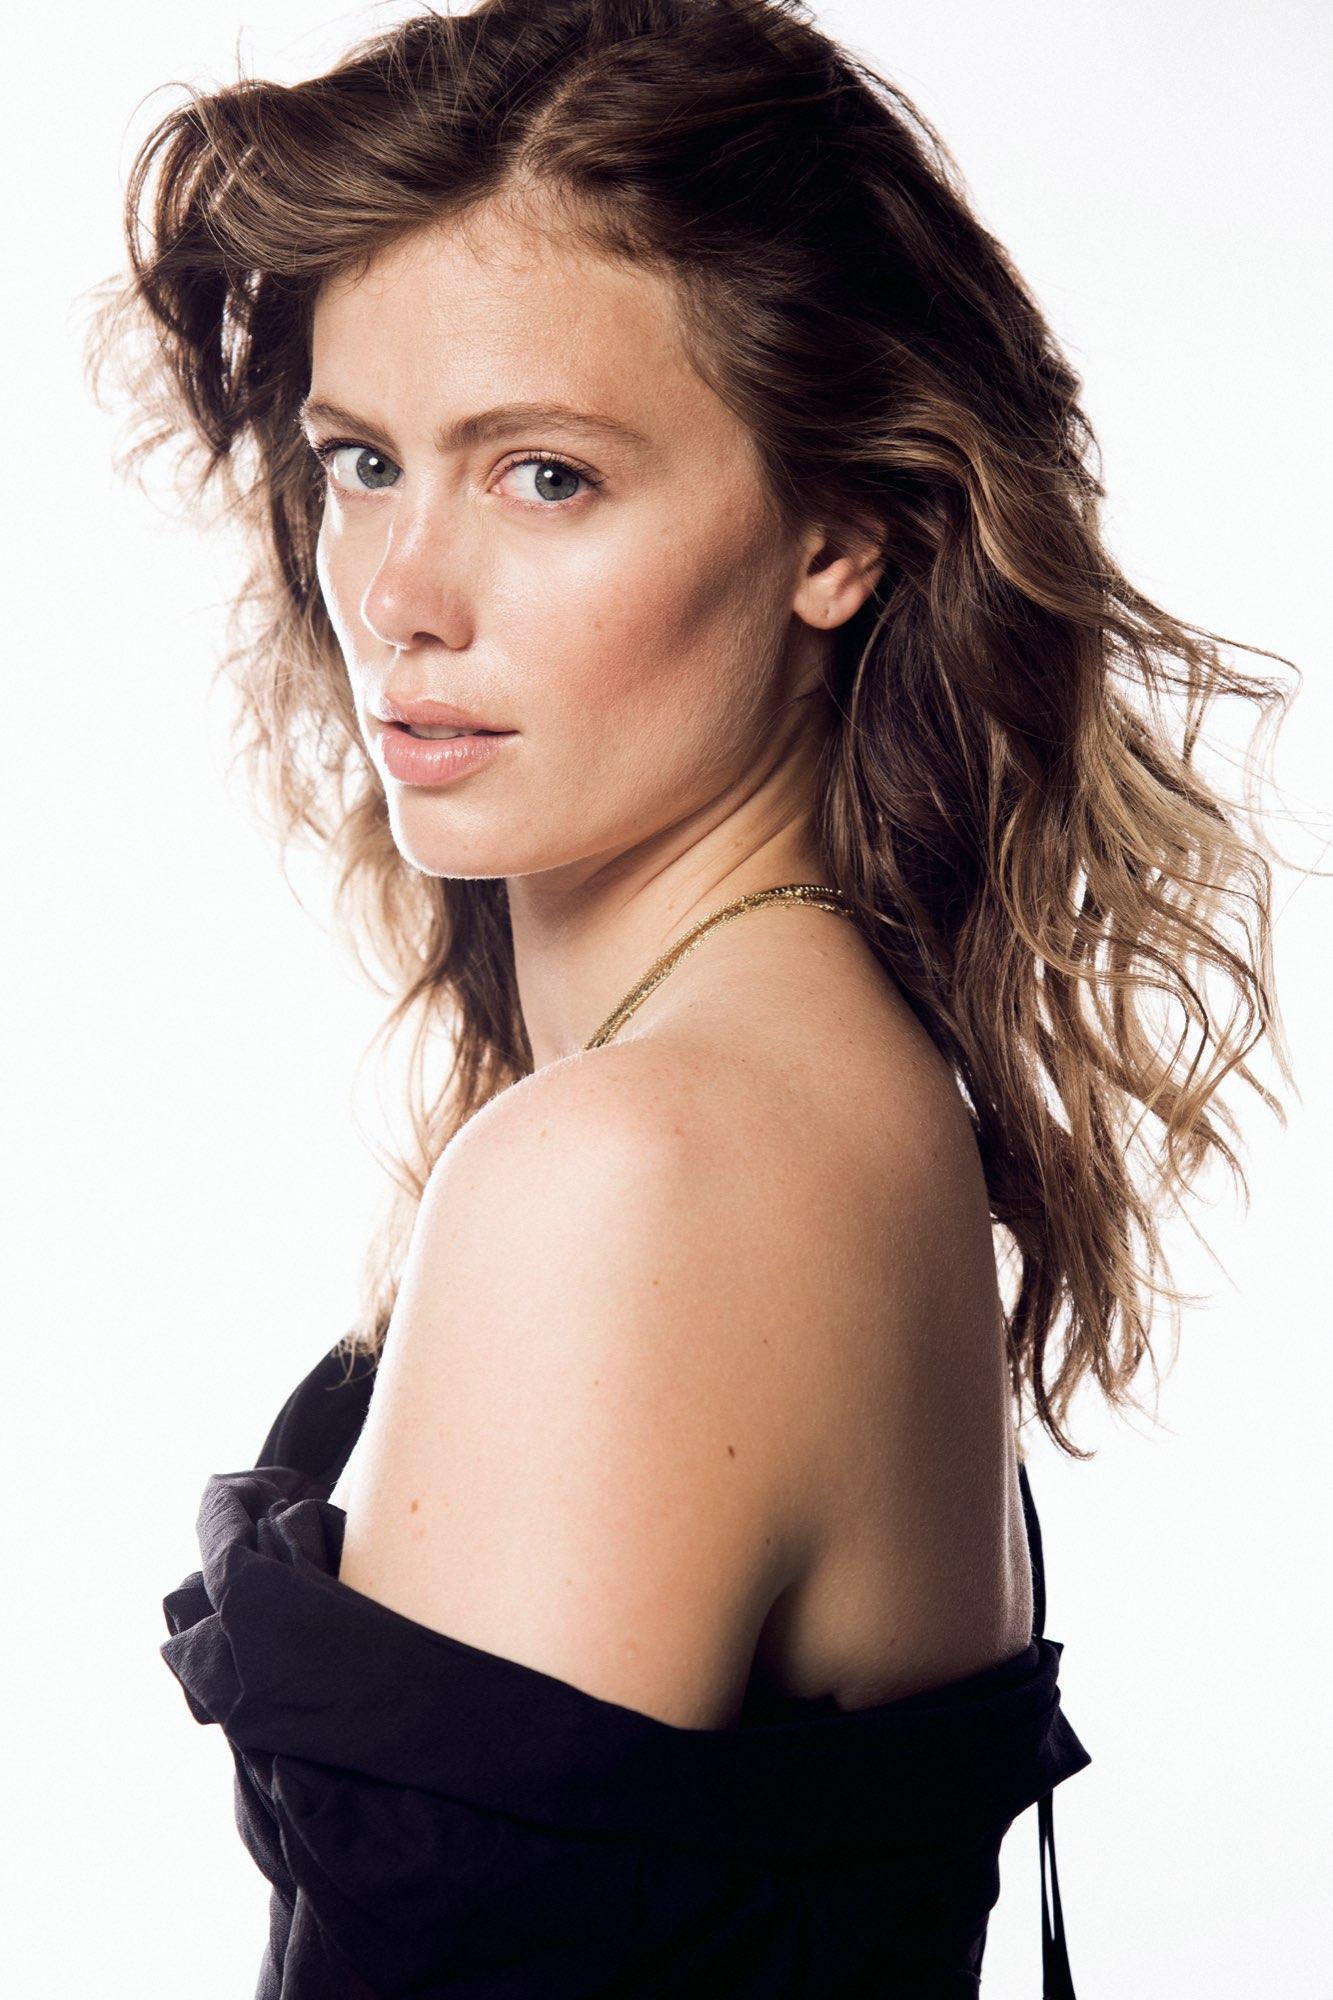 Hair, Nail, Make-up und Fashion styling portfolio / laura-moser - testshooting-ellin-portfolio--ID678-2.jpeg?v=1597754140